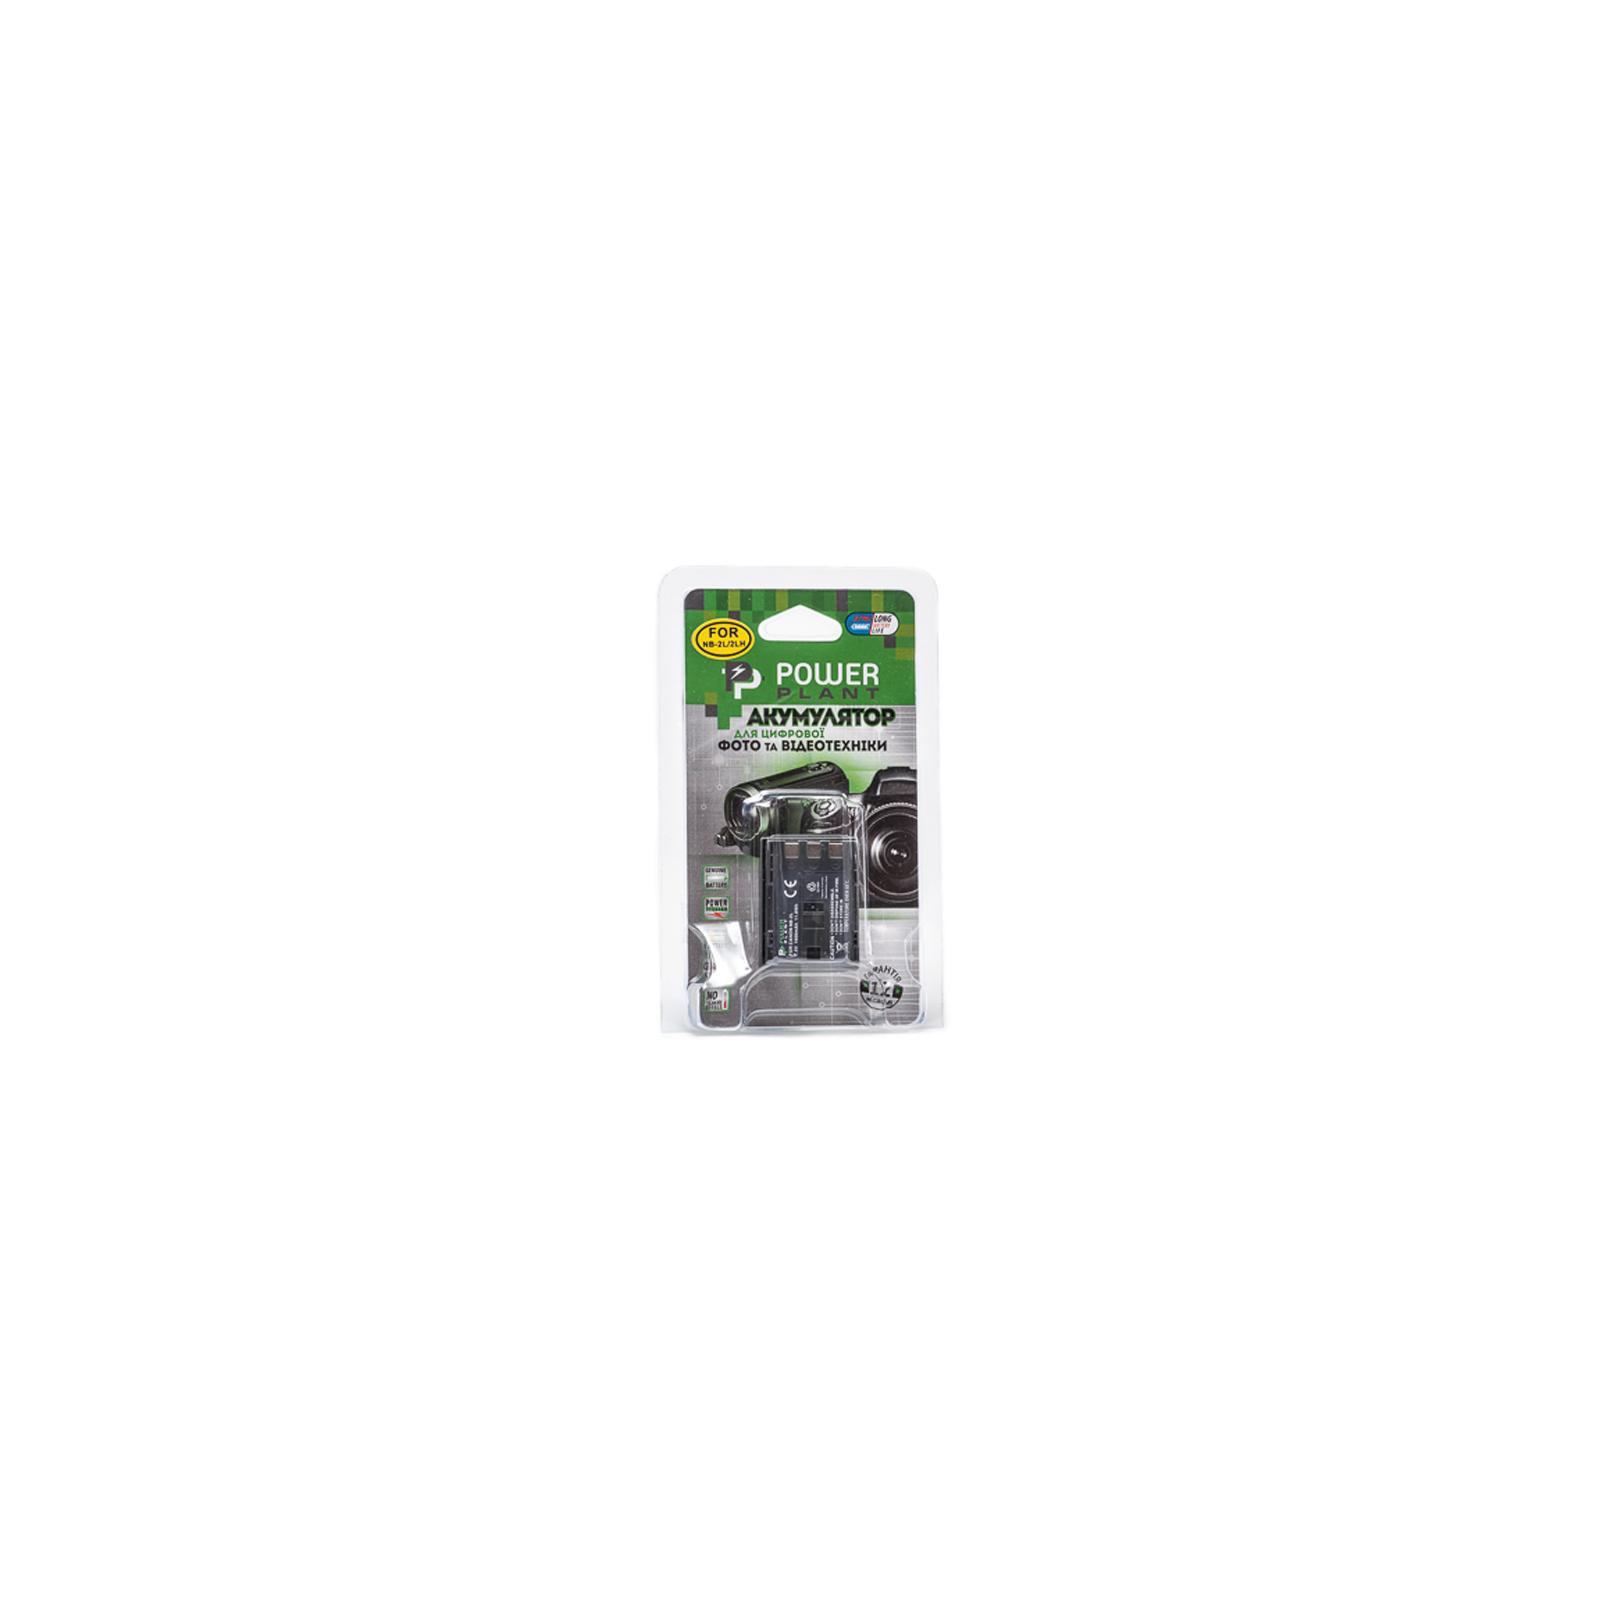 Аккумулятор к фото/видео Canon NB-2LH, NB-2L PowerPlant (DV00DV1059) изображение 3